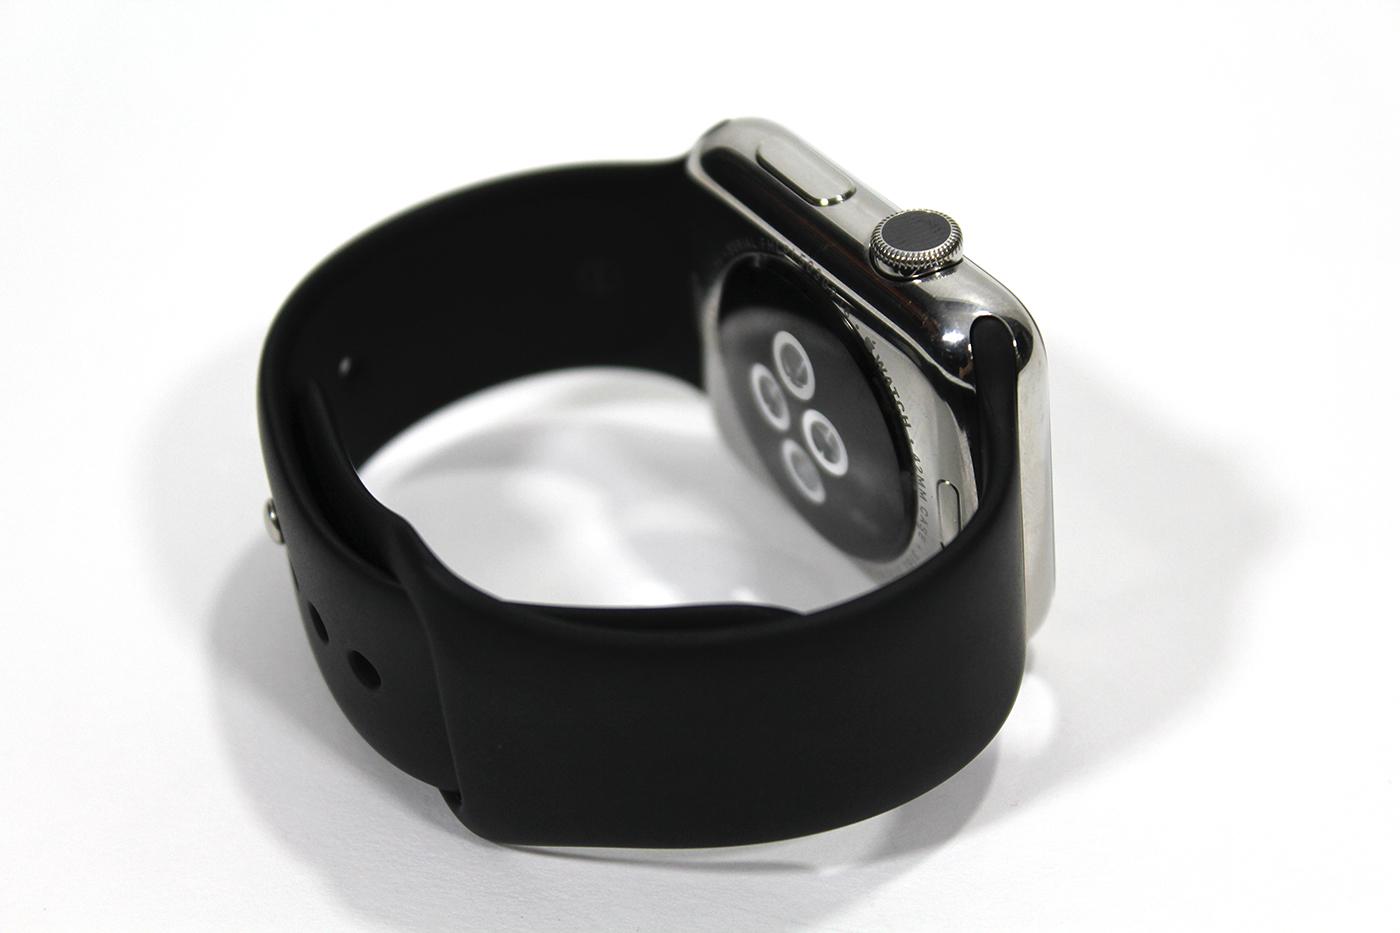 Apple Watch Crown